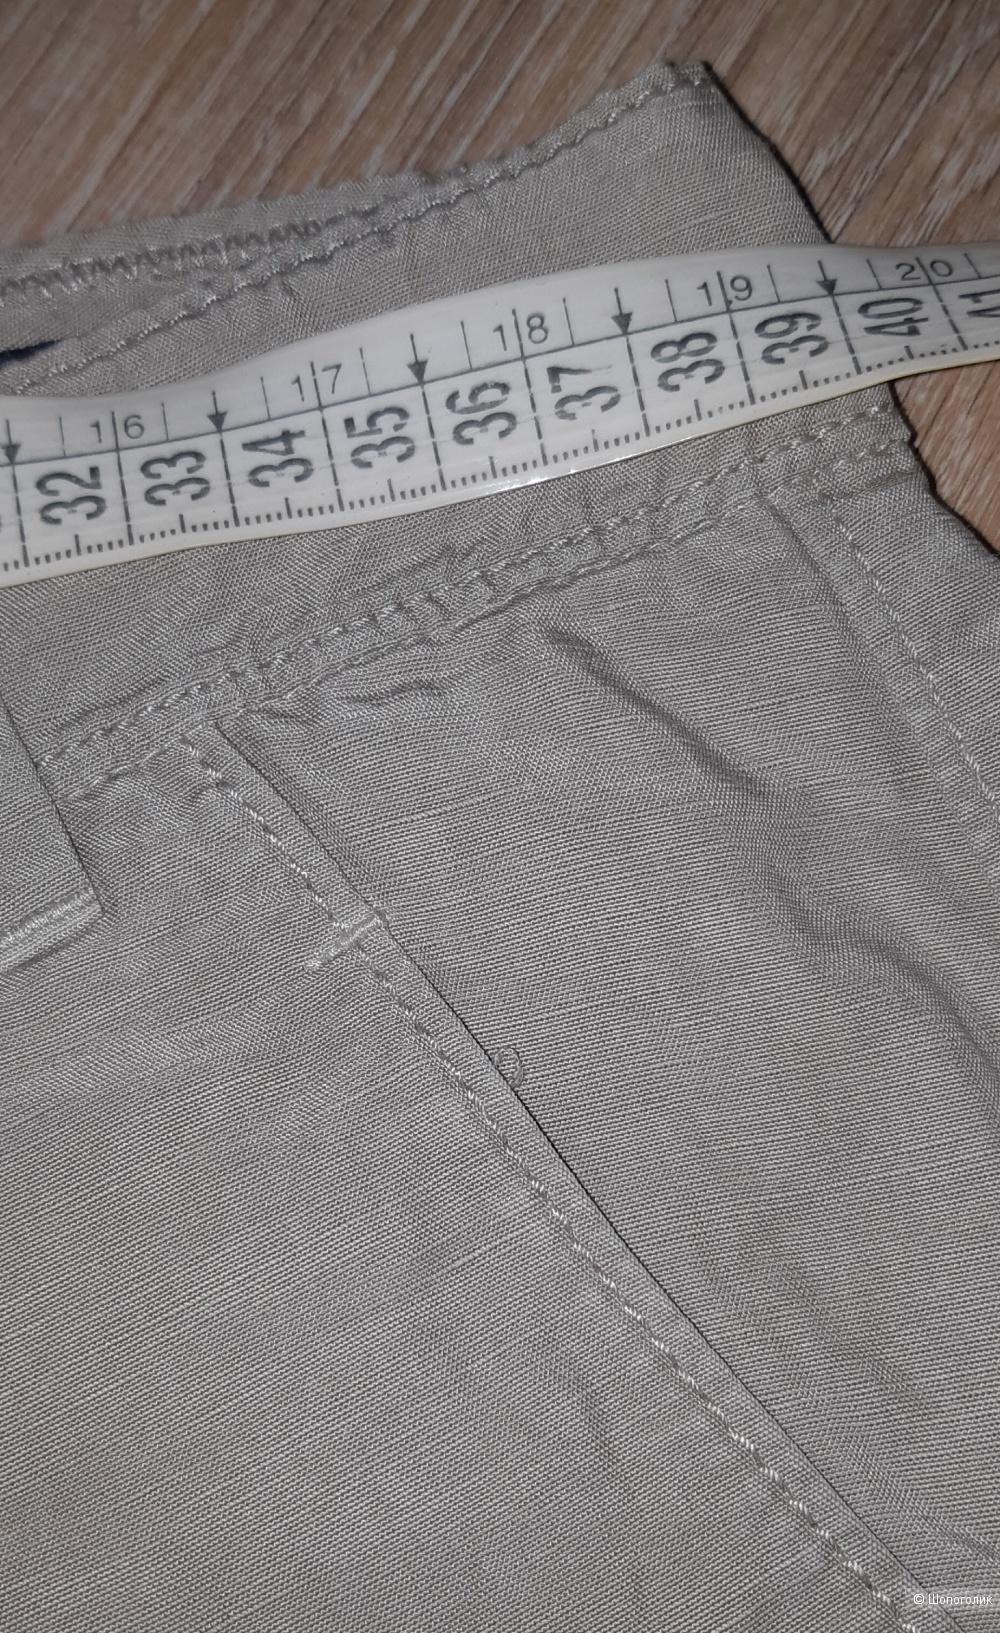 Сет шорты marc o'polo/блуза only, размер 42/44